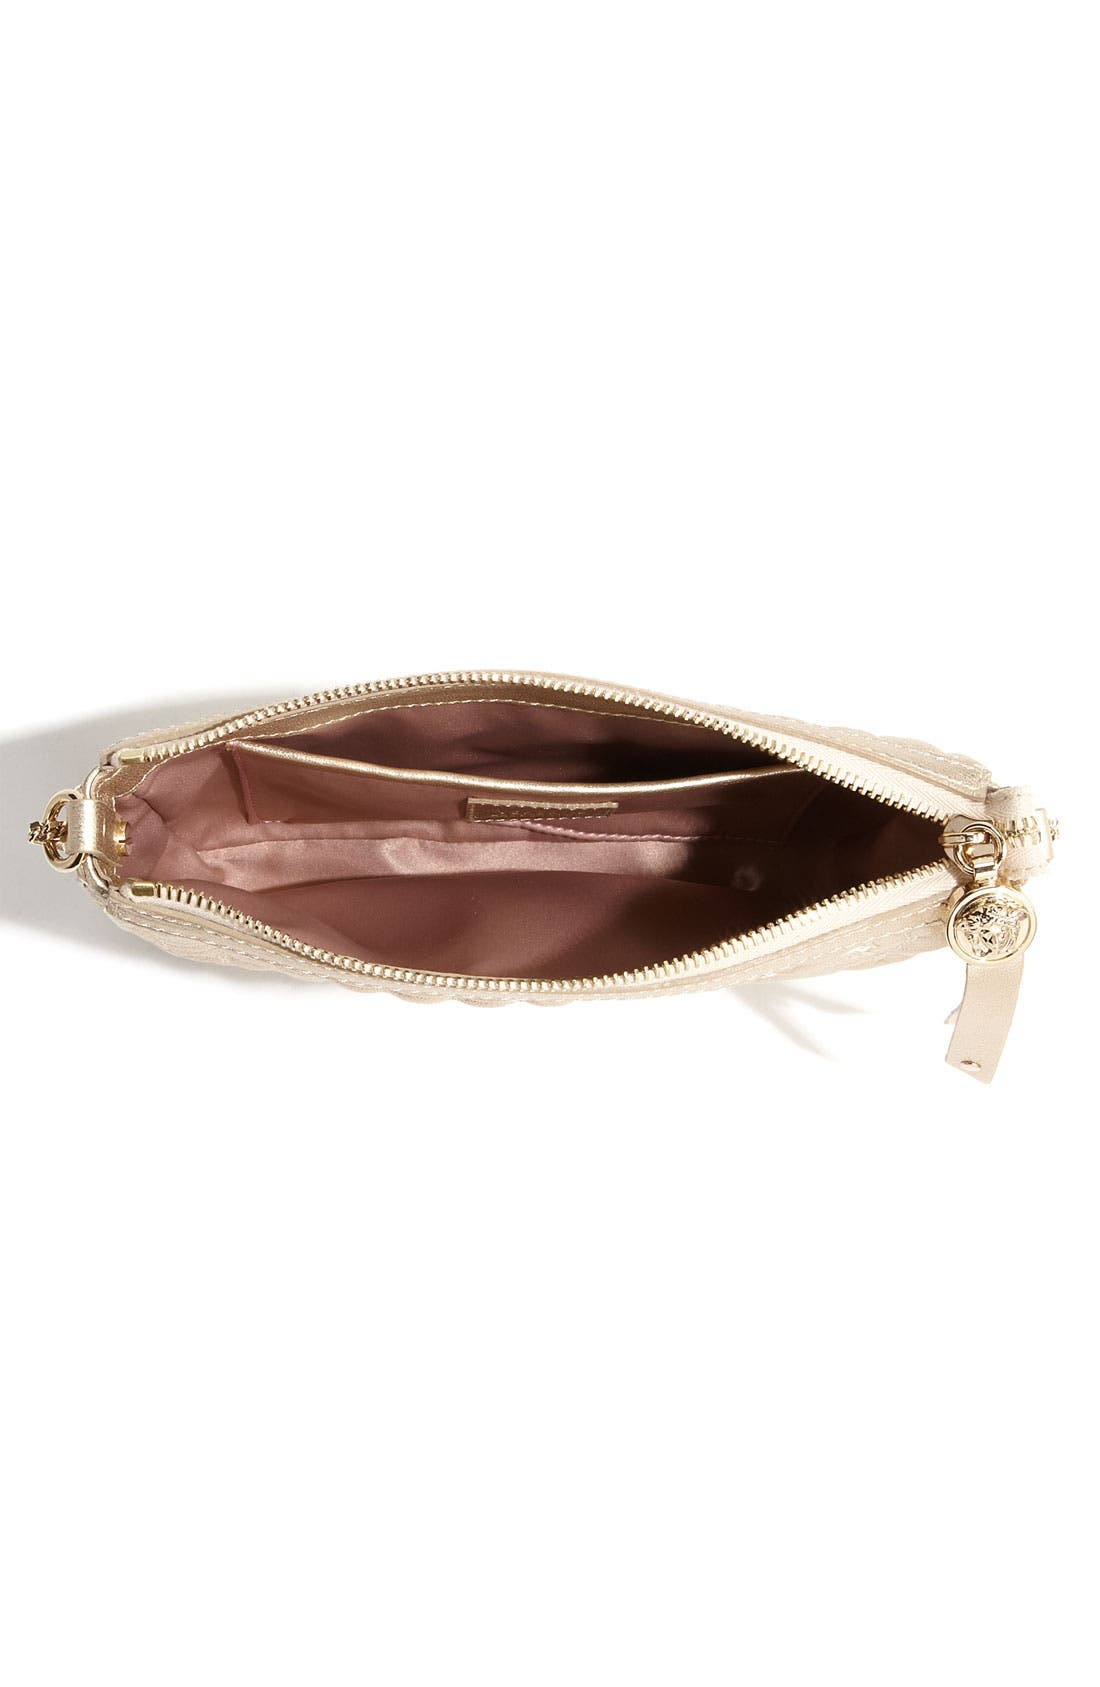 Alternate Image 3  - Versace 'Vanitas' Embroidered Leather Crossbody Bag